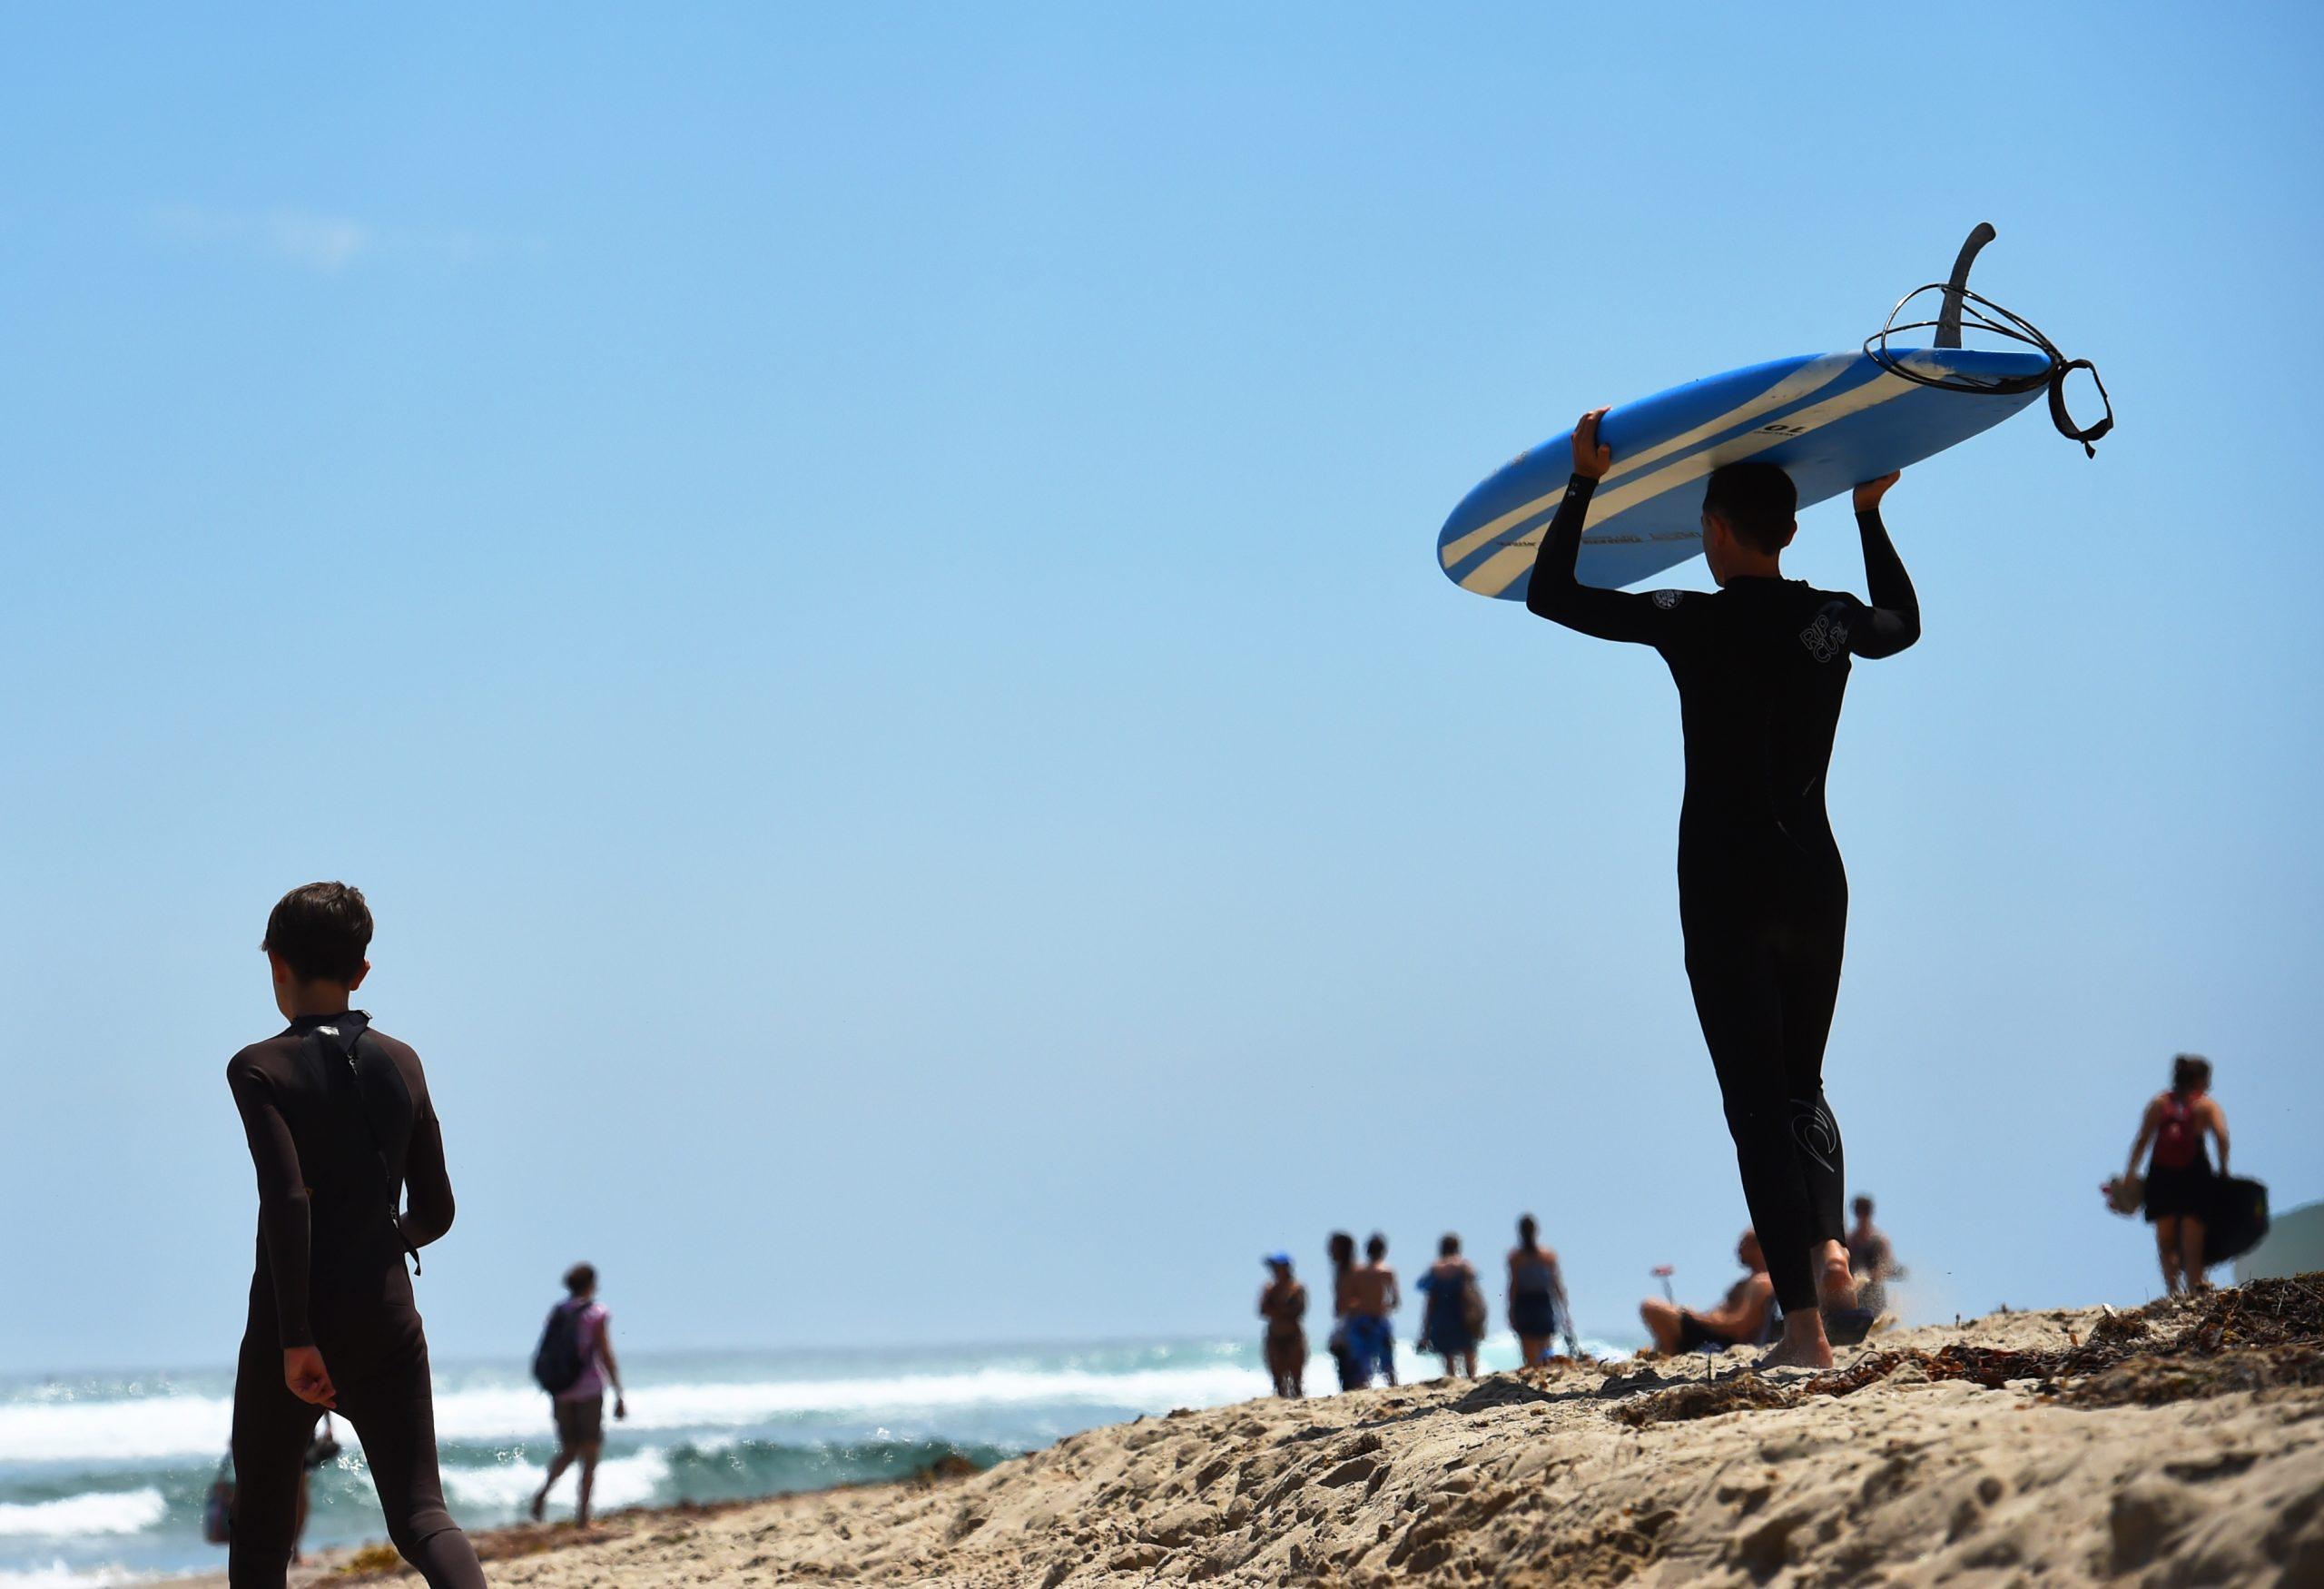 Surfers on shore at Malibu Surfrider Beach